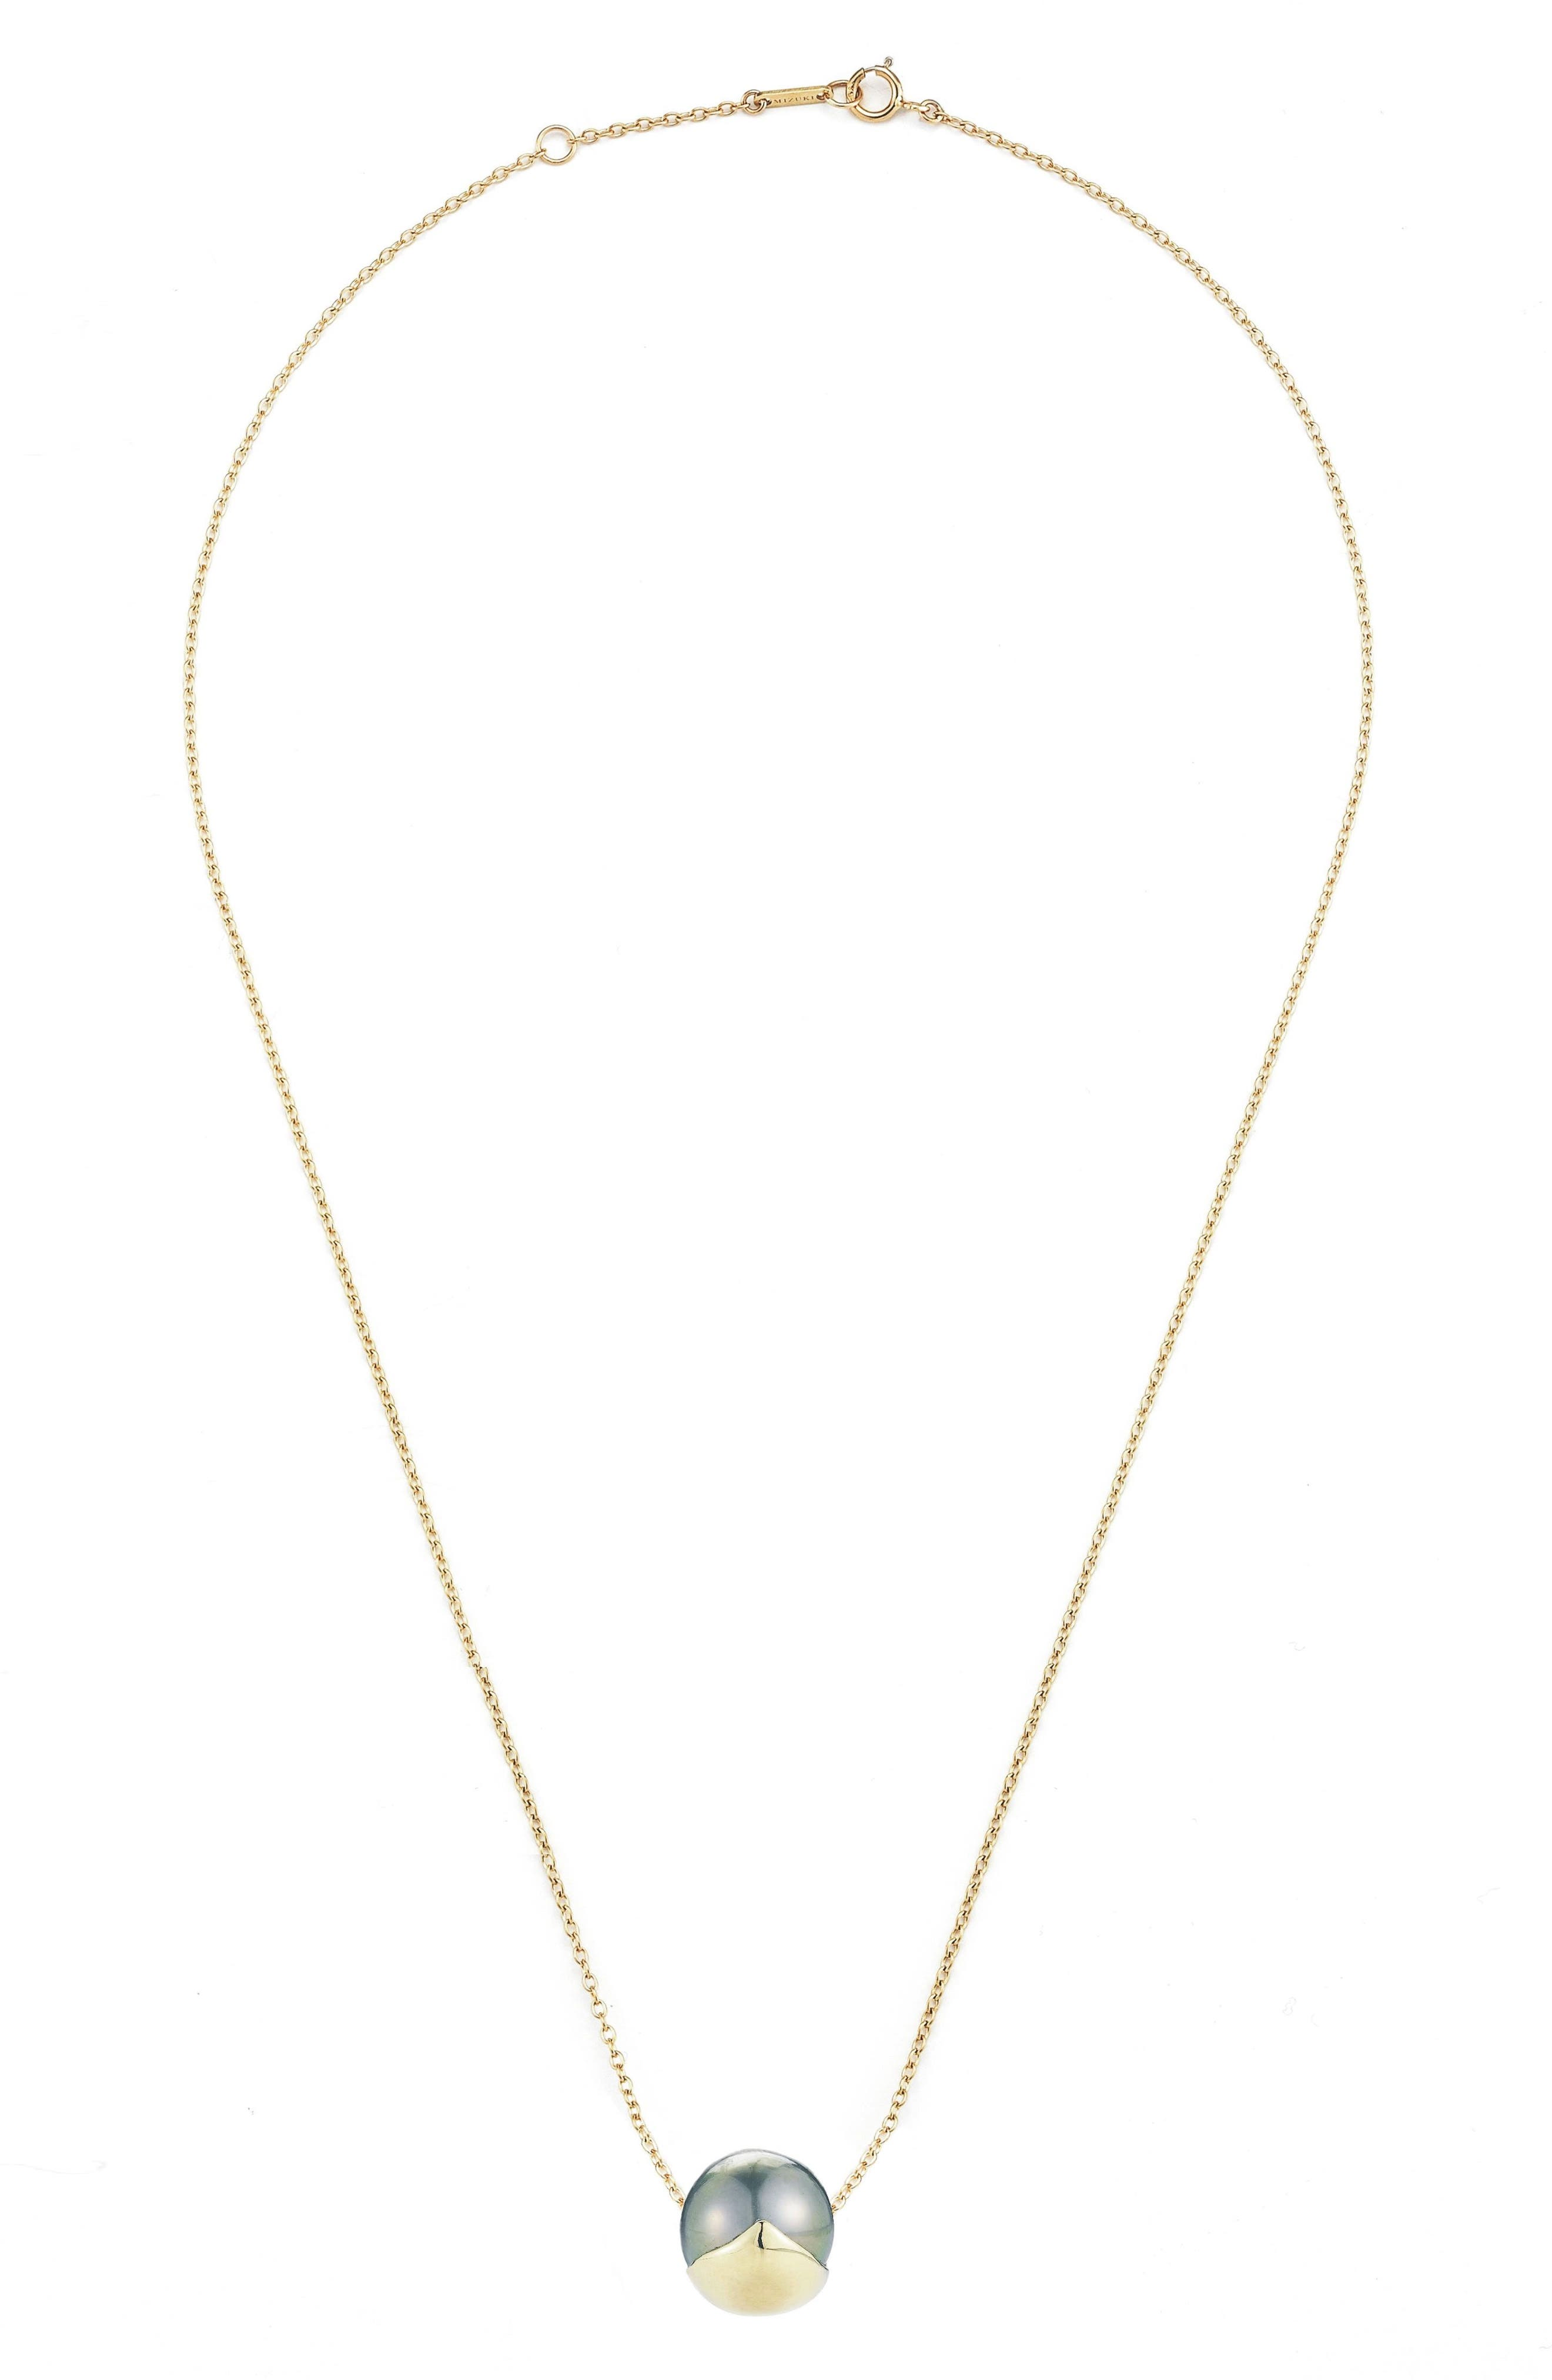 Main Image - Mizuki Sea of Beauty Pearl Pendant Necklace